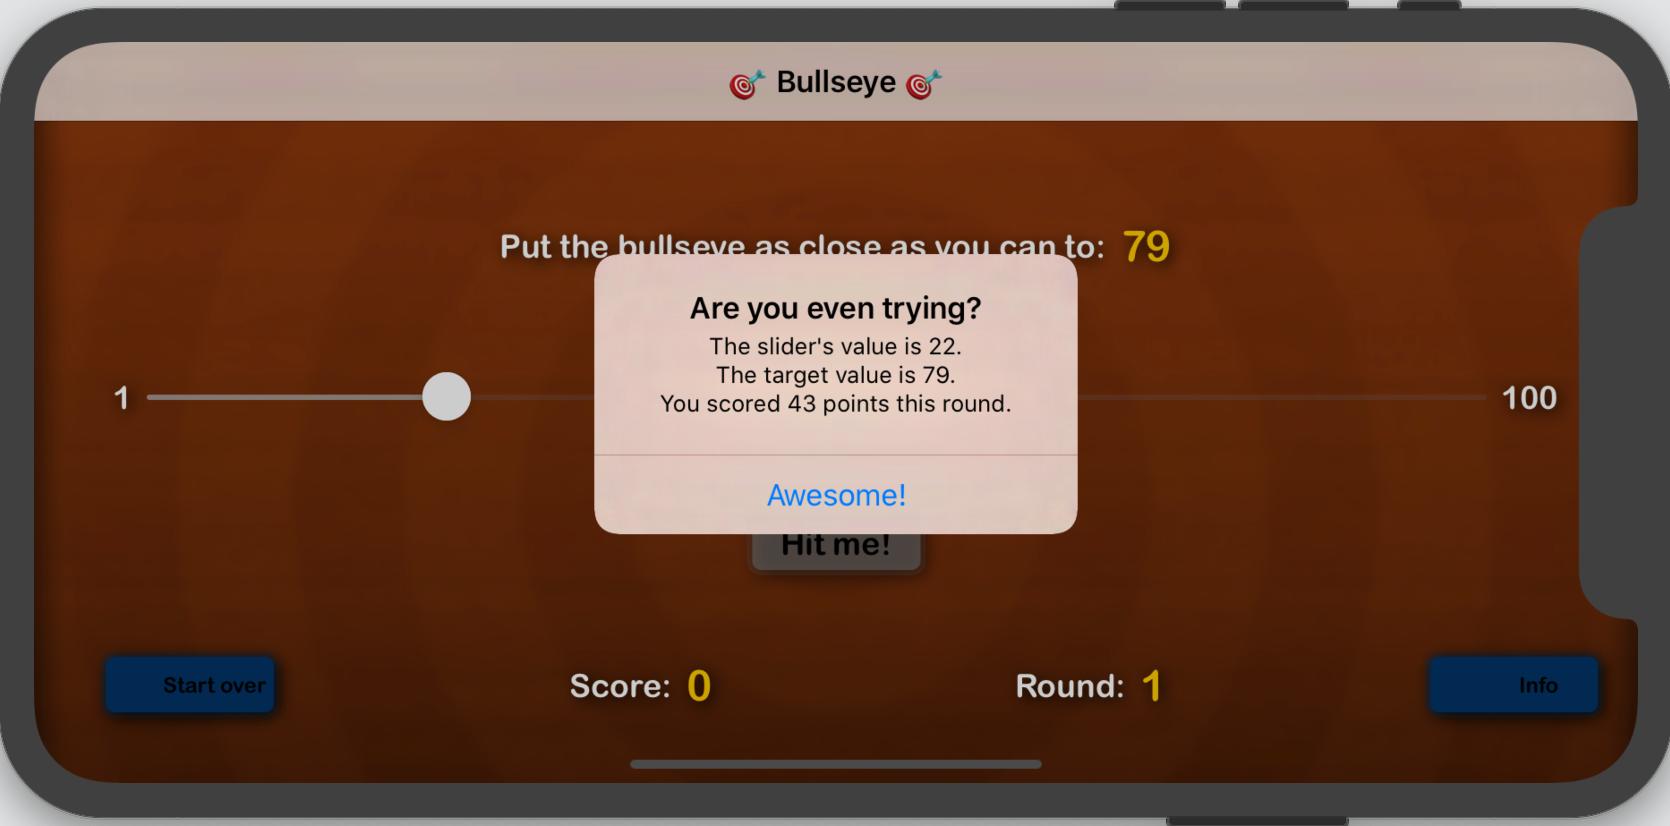 The Bullseye app displays its alert pop-up